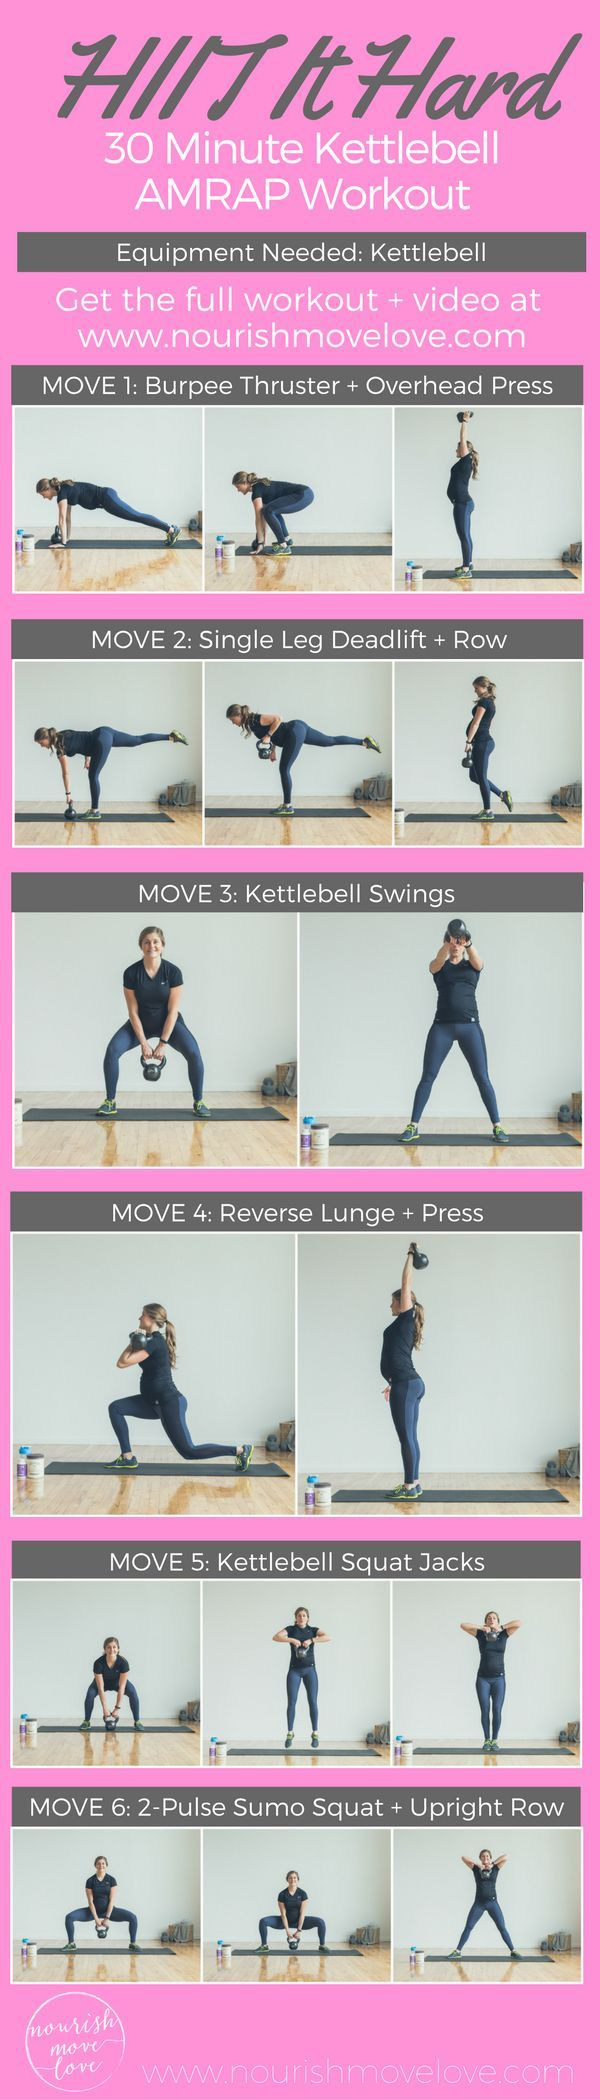 Fitness Motivation : HIIT It Hard 30-Minute Kettlebell AMRAP